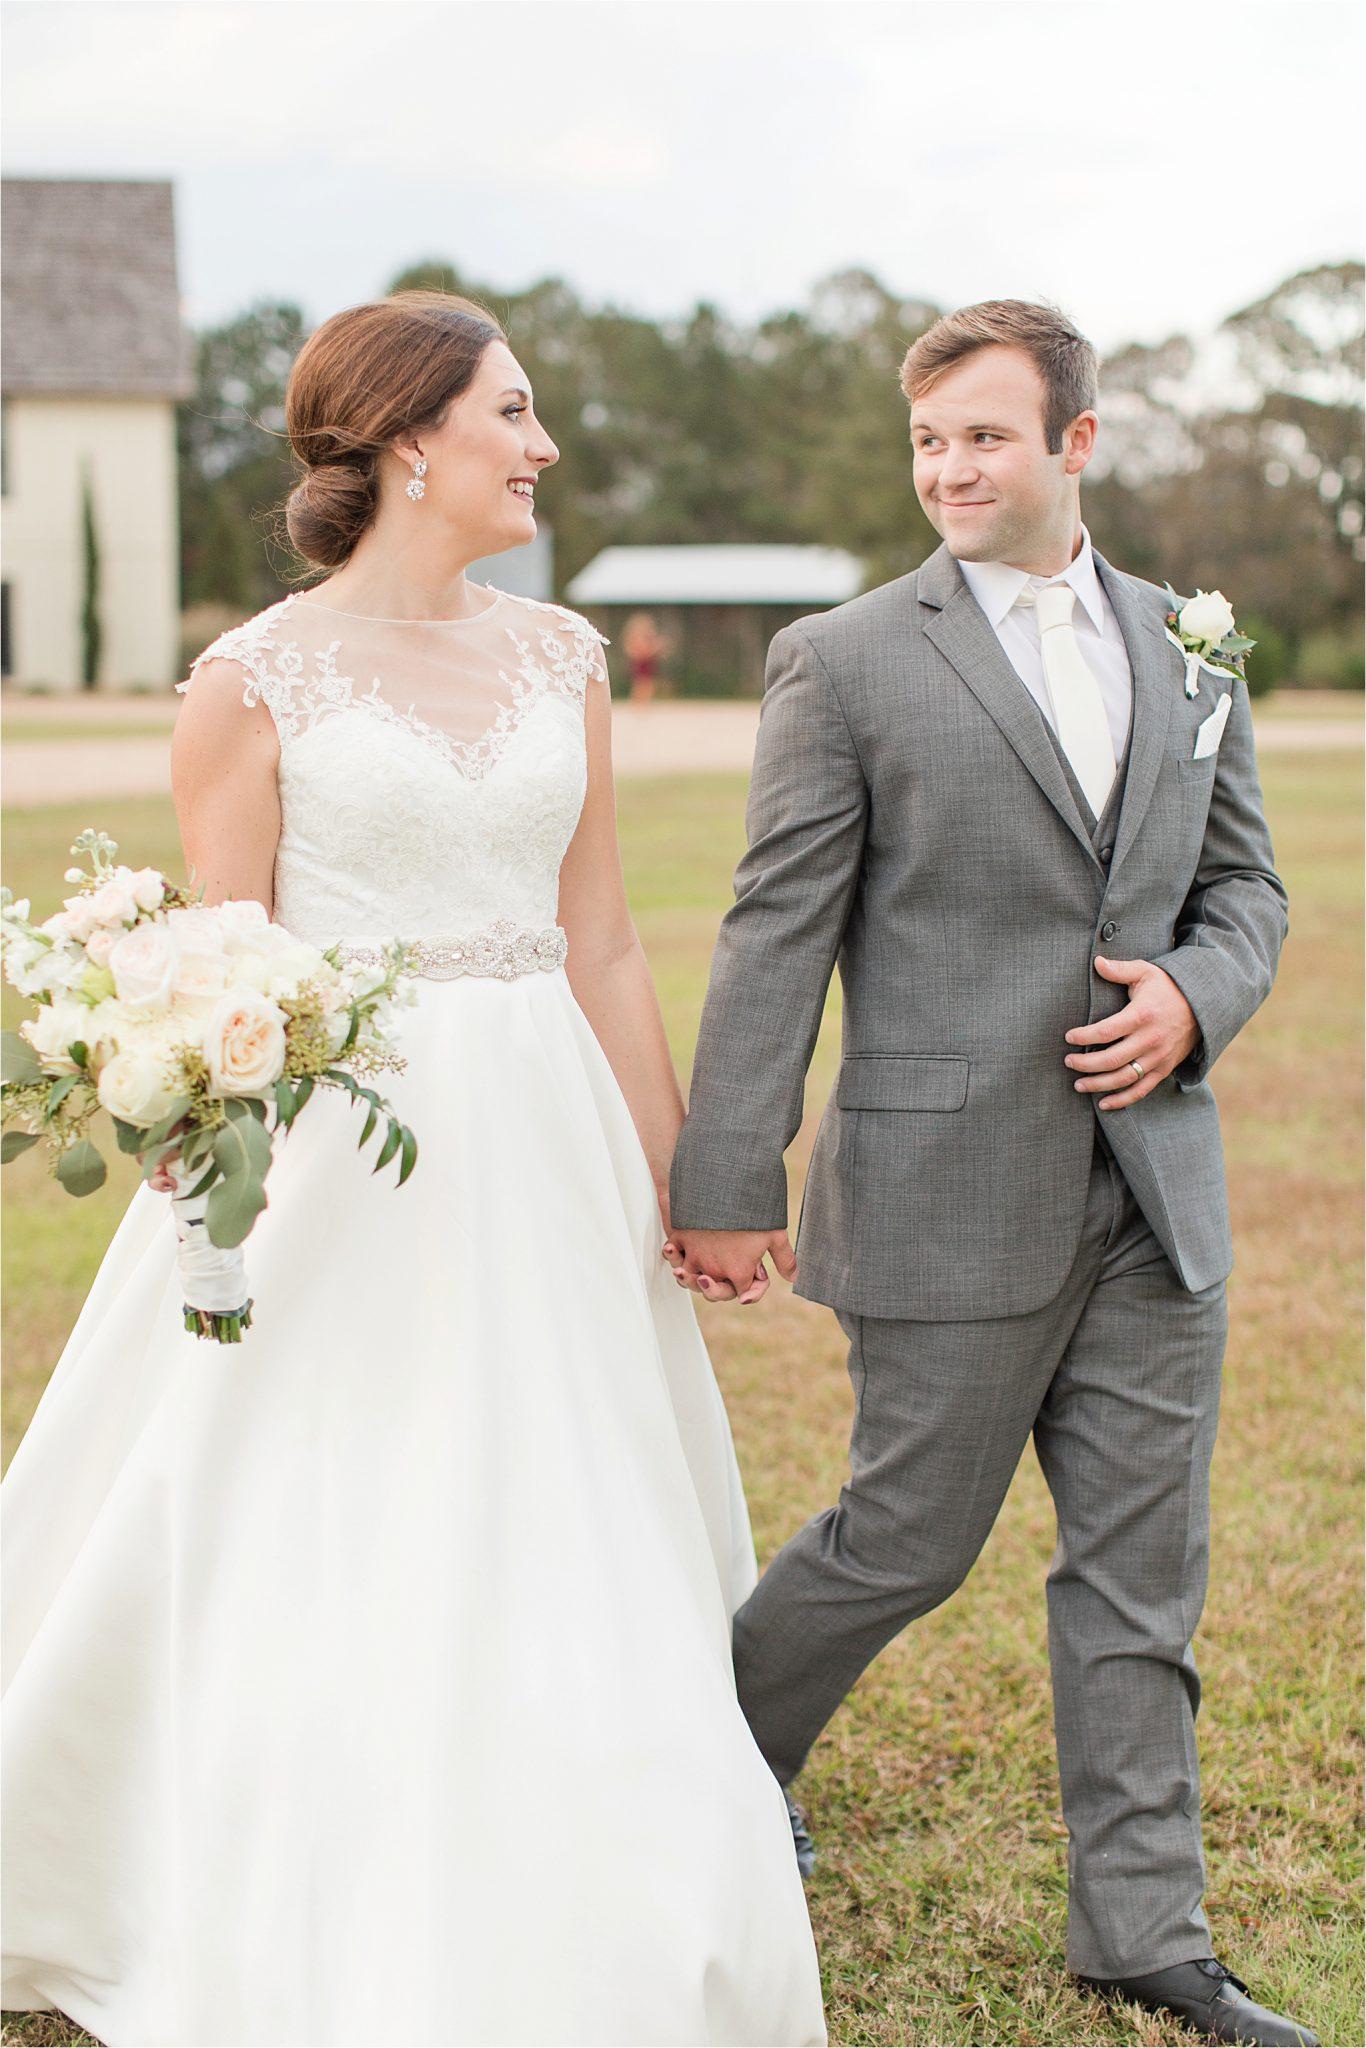 The Barn at Bridlewood Wedding-Hattiesburg, Mississippi-Kelsey + Blake-Wedding details-Barn wedding-Ruby wedding-Autumn themed wedding-Wedding dress-Bride and groom